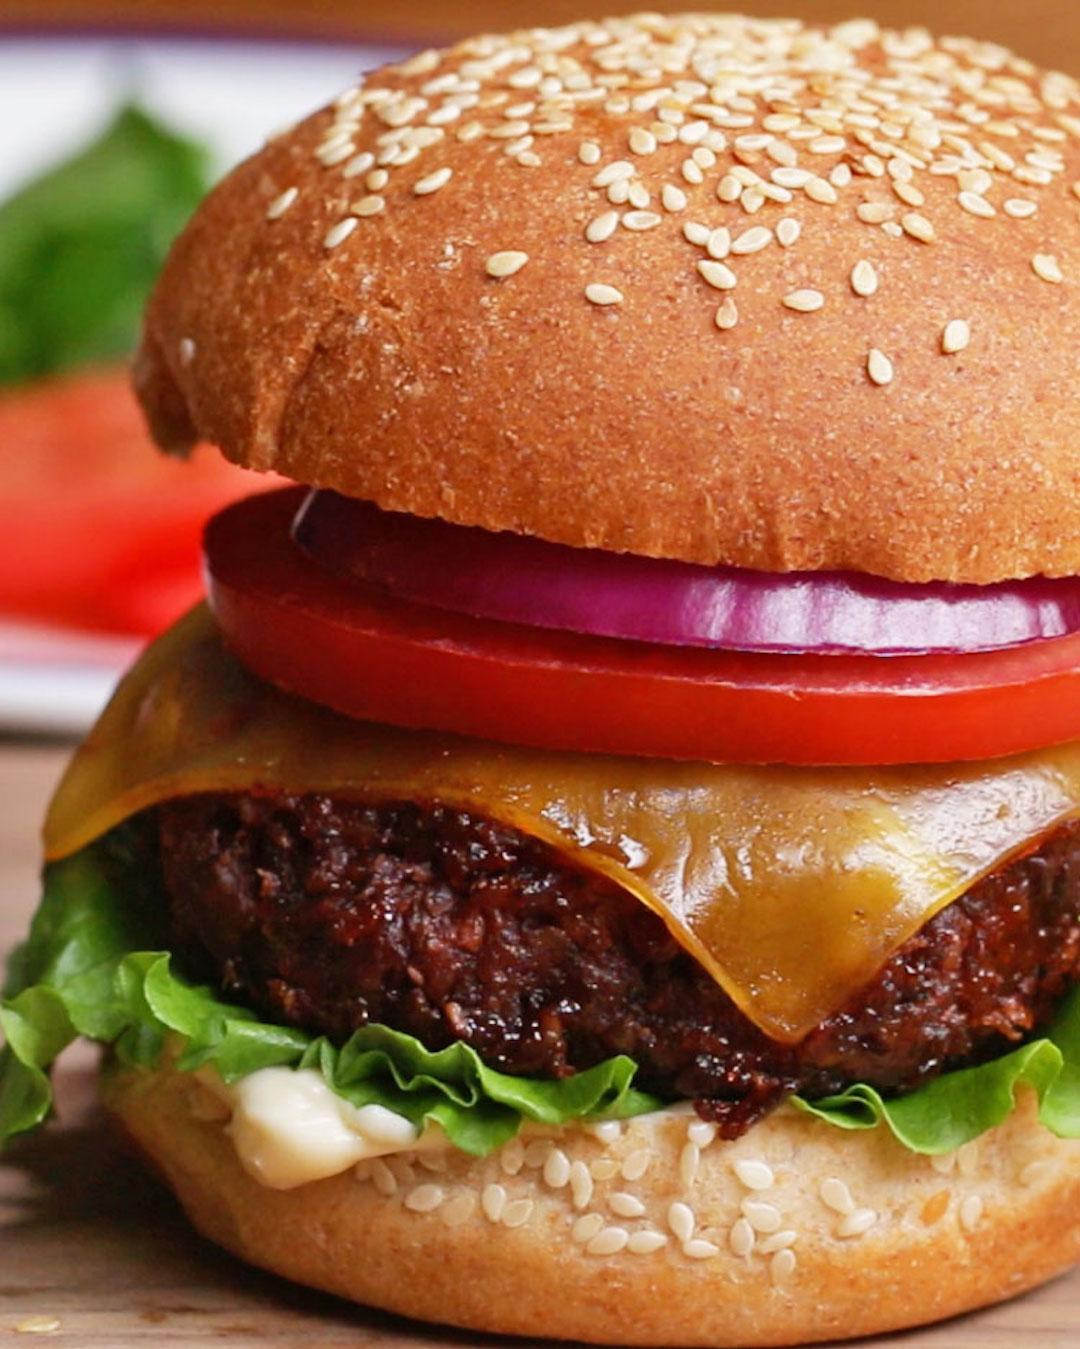 The Best Ever Vegan Burger Recipe By Tasty